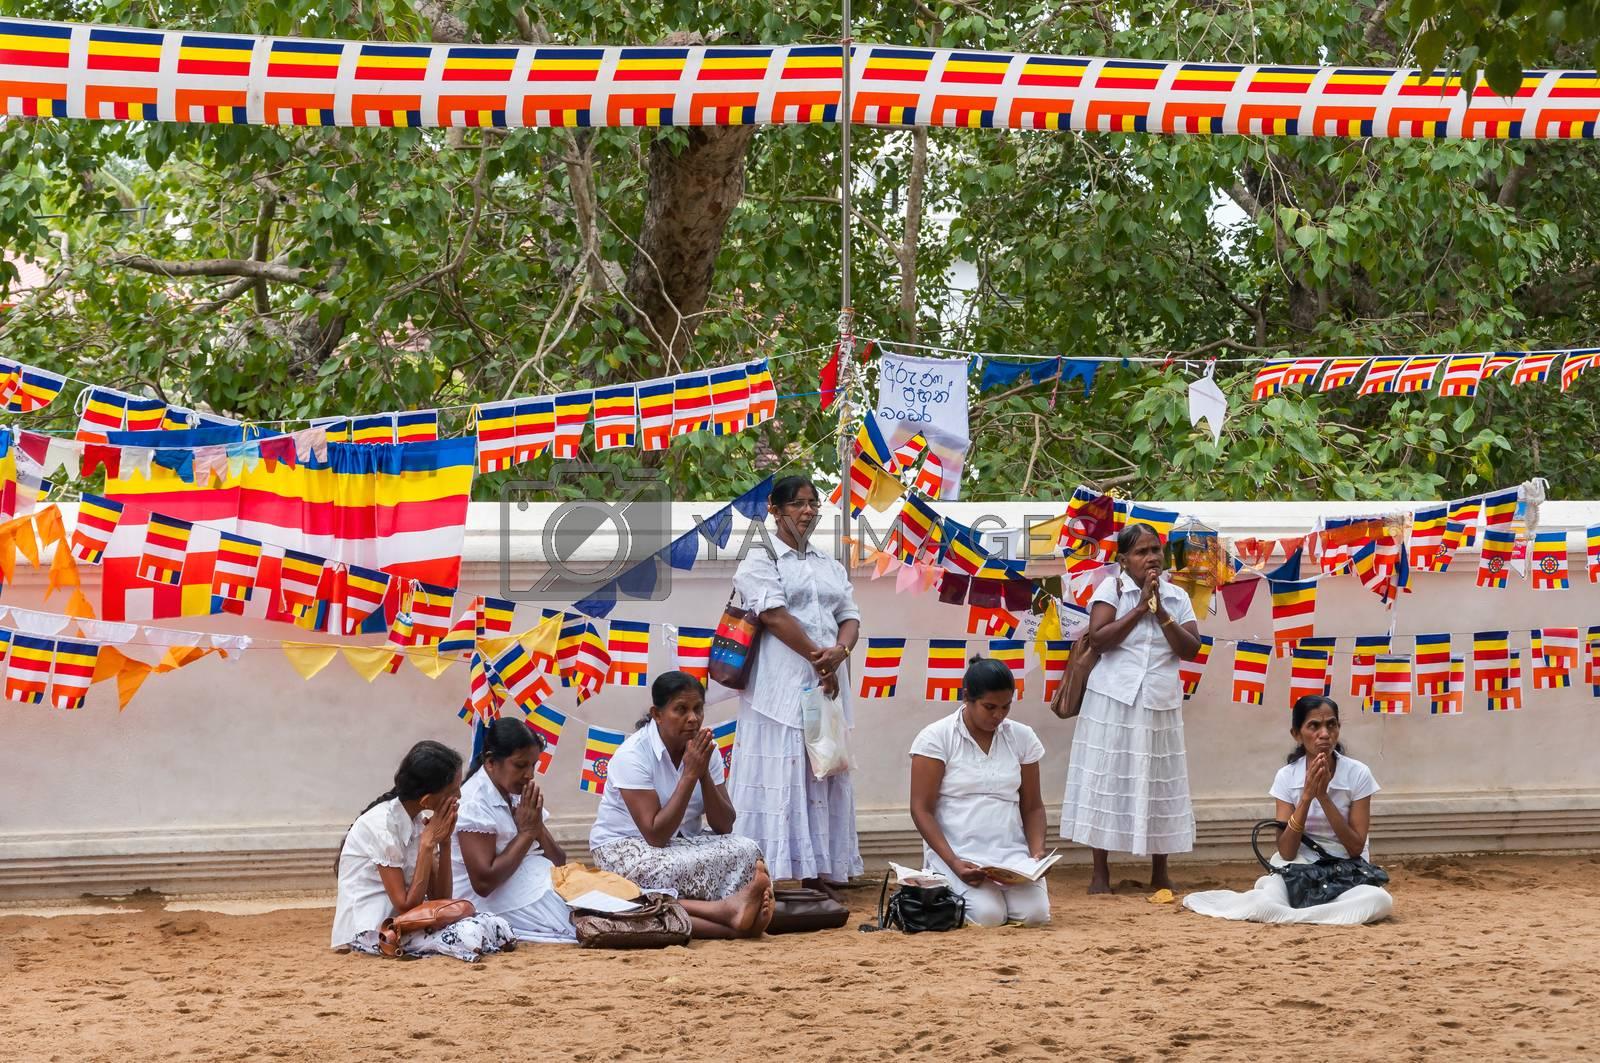 ANURADHAPURA, SRI LANKA - FEBRUARY 14: Sri Lankan women pray at buddhist temple on February 14, 2013 in Anuradhapura. The temple is location of Sri Maha Bodhi the oldest living human planted tree in the world.